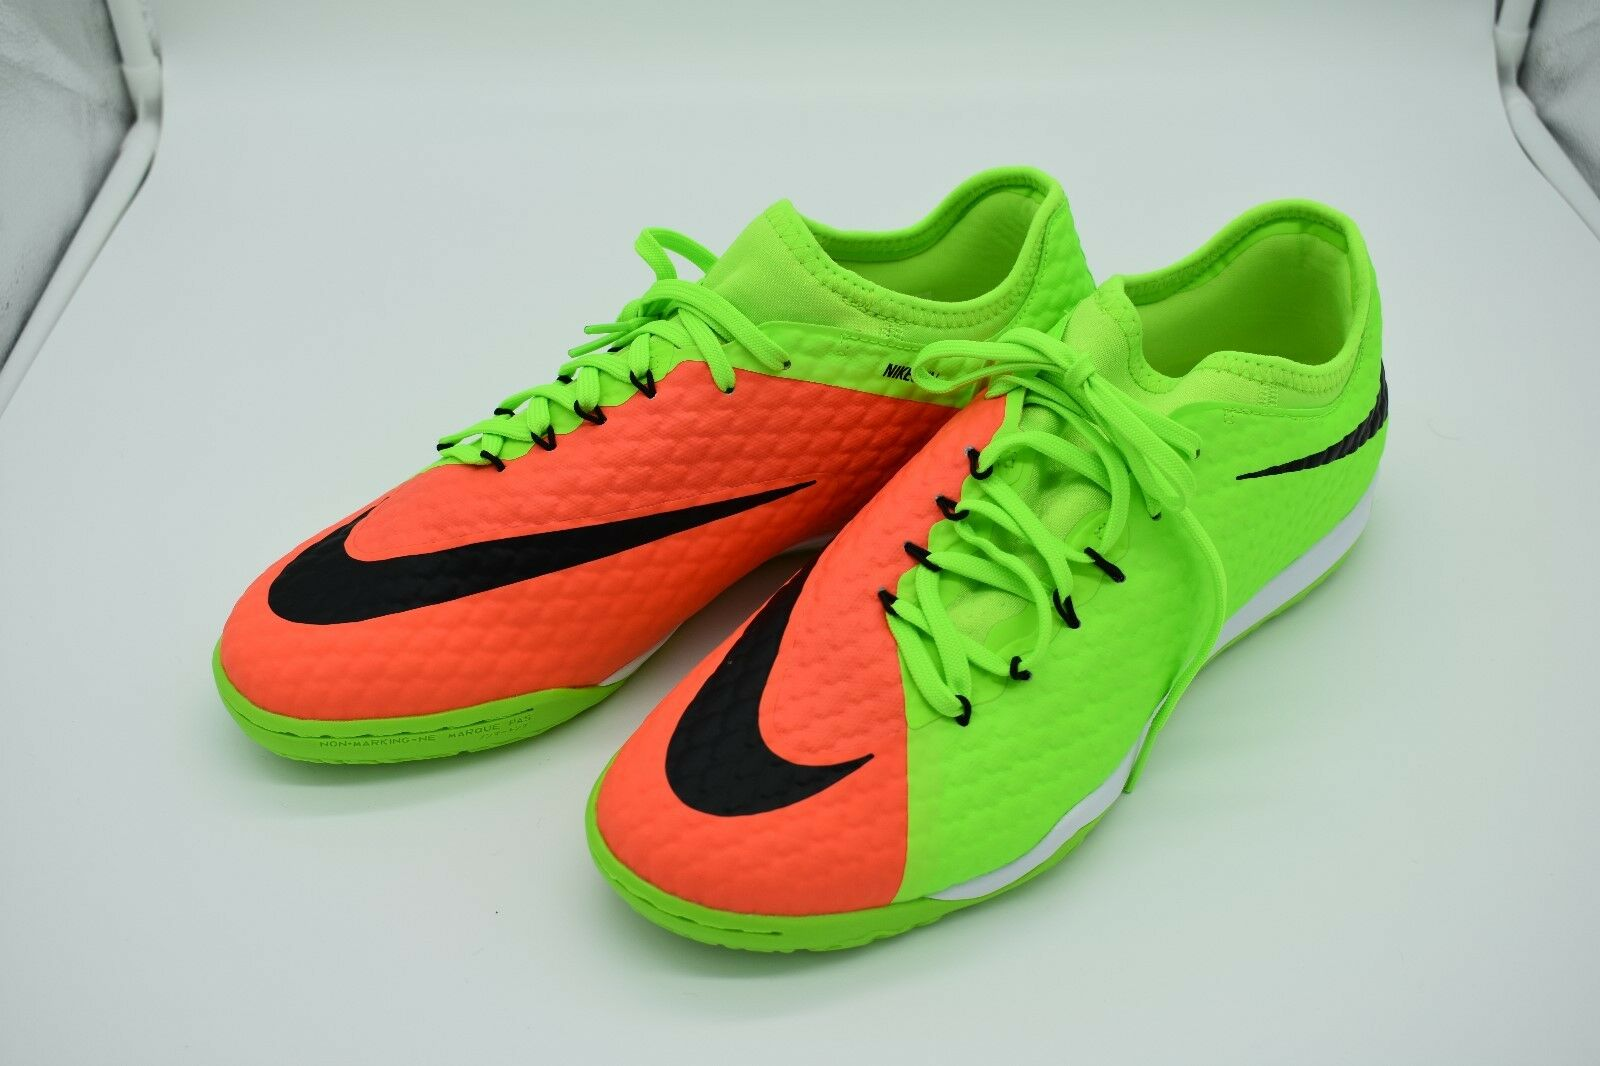 Nike hypervenomx finale ii ic uomini ?? s indoor 852572-308 scarpe taglia